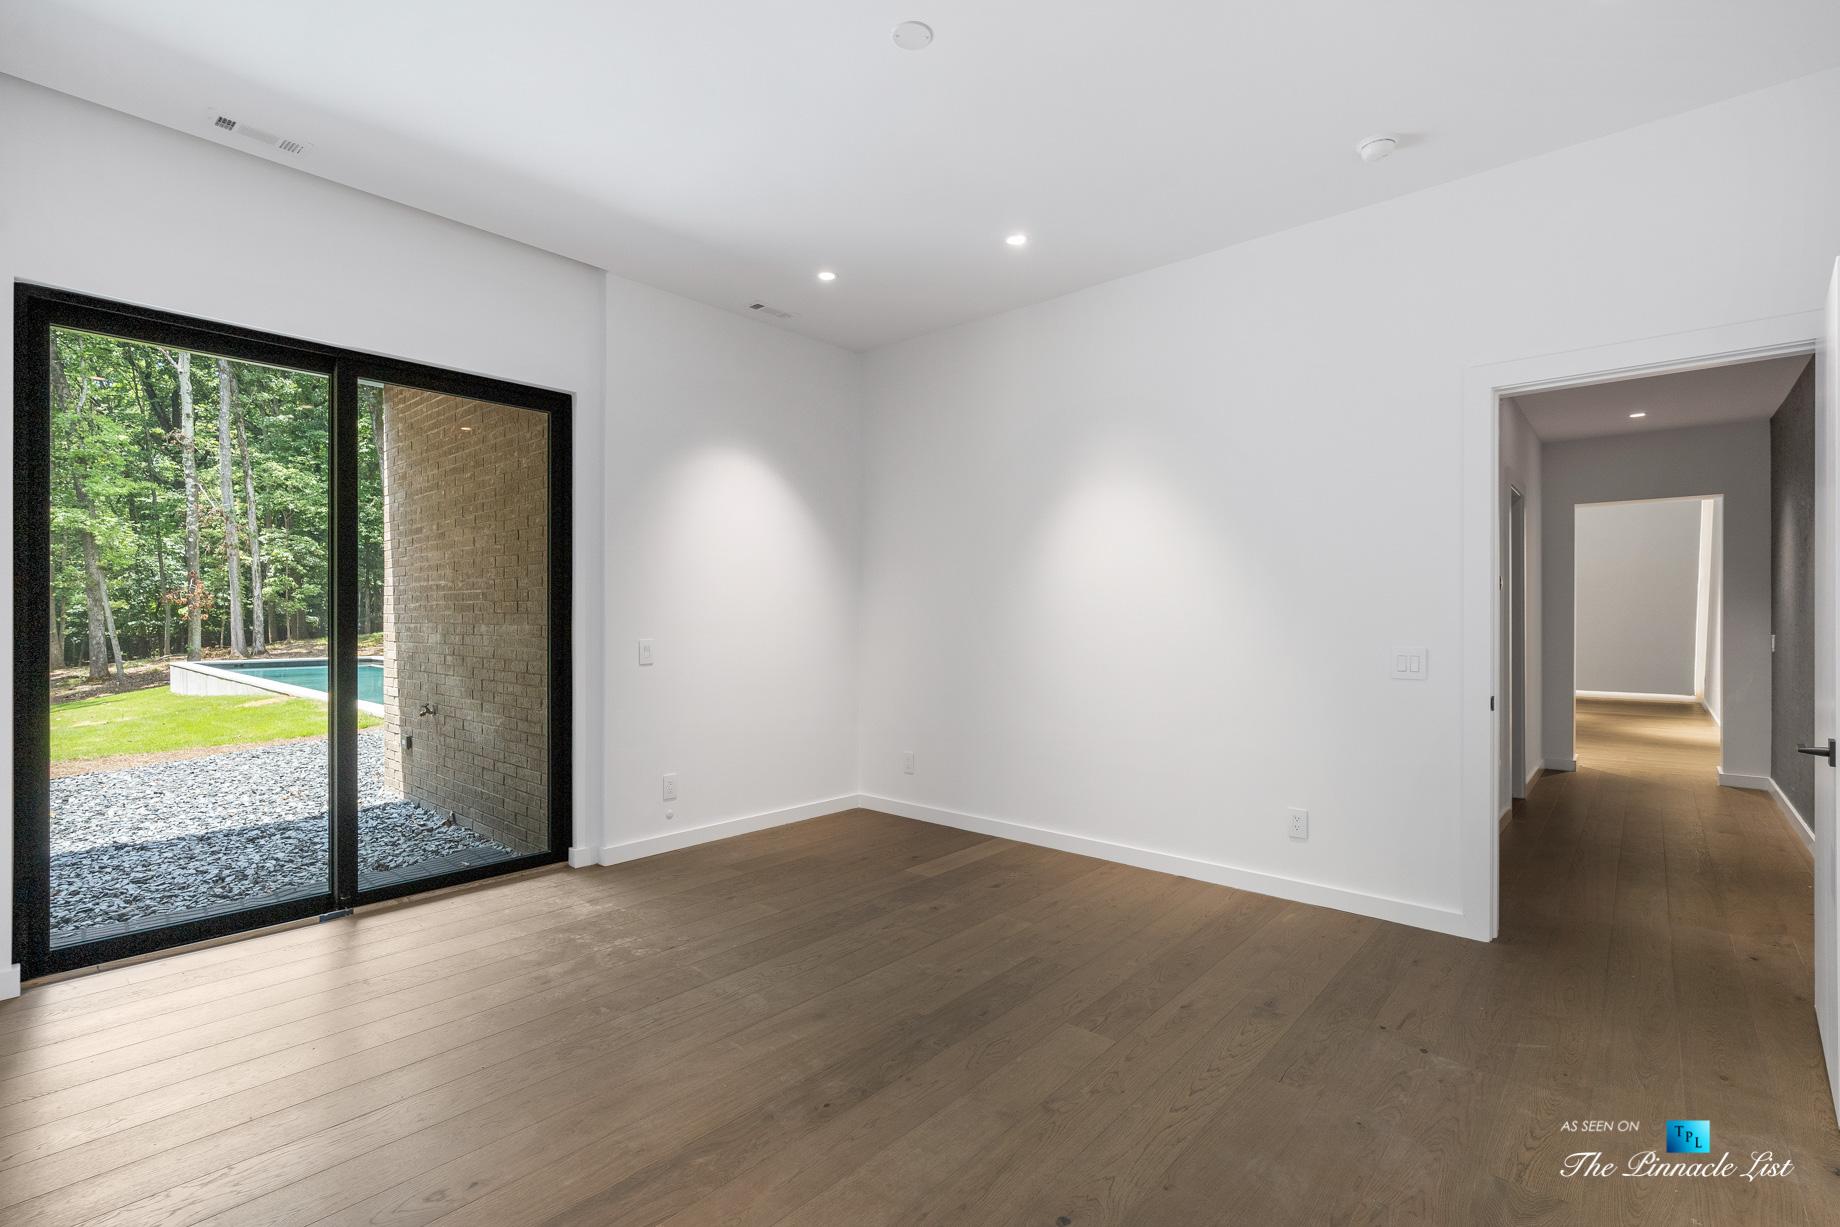 2716 Ridgewood Rd NW, Atlanta, GA, USA - Bedroom - Luxury Real Estate - Modern Contemporary Buckhead Home